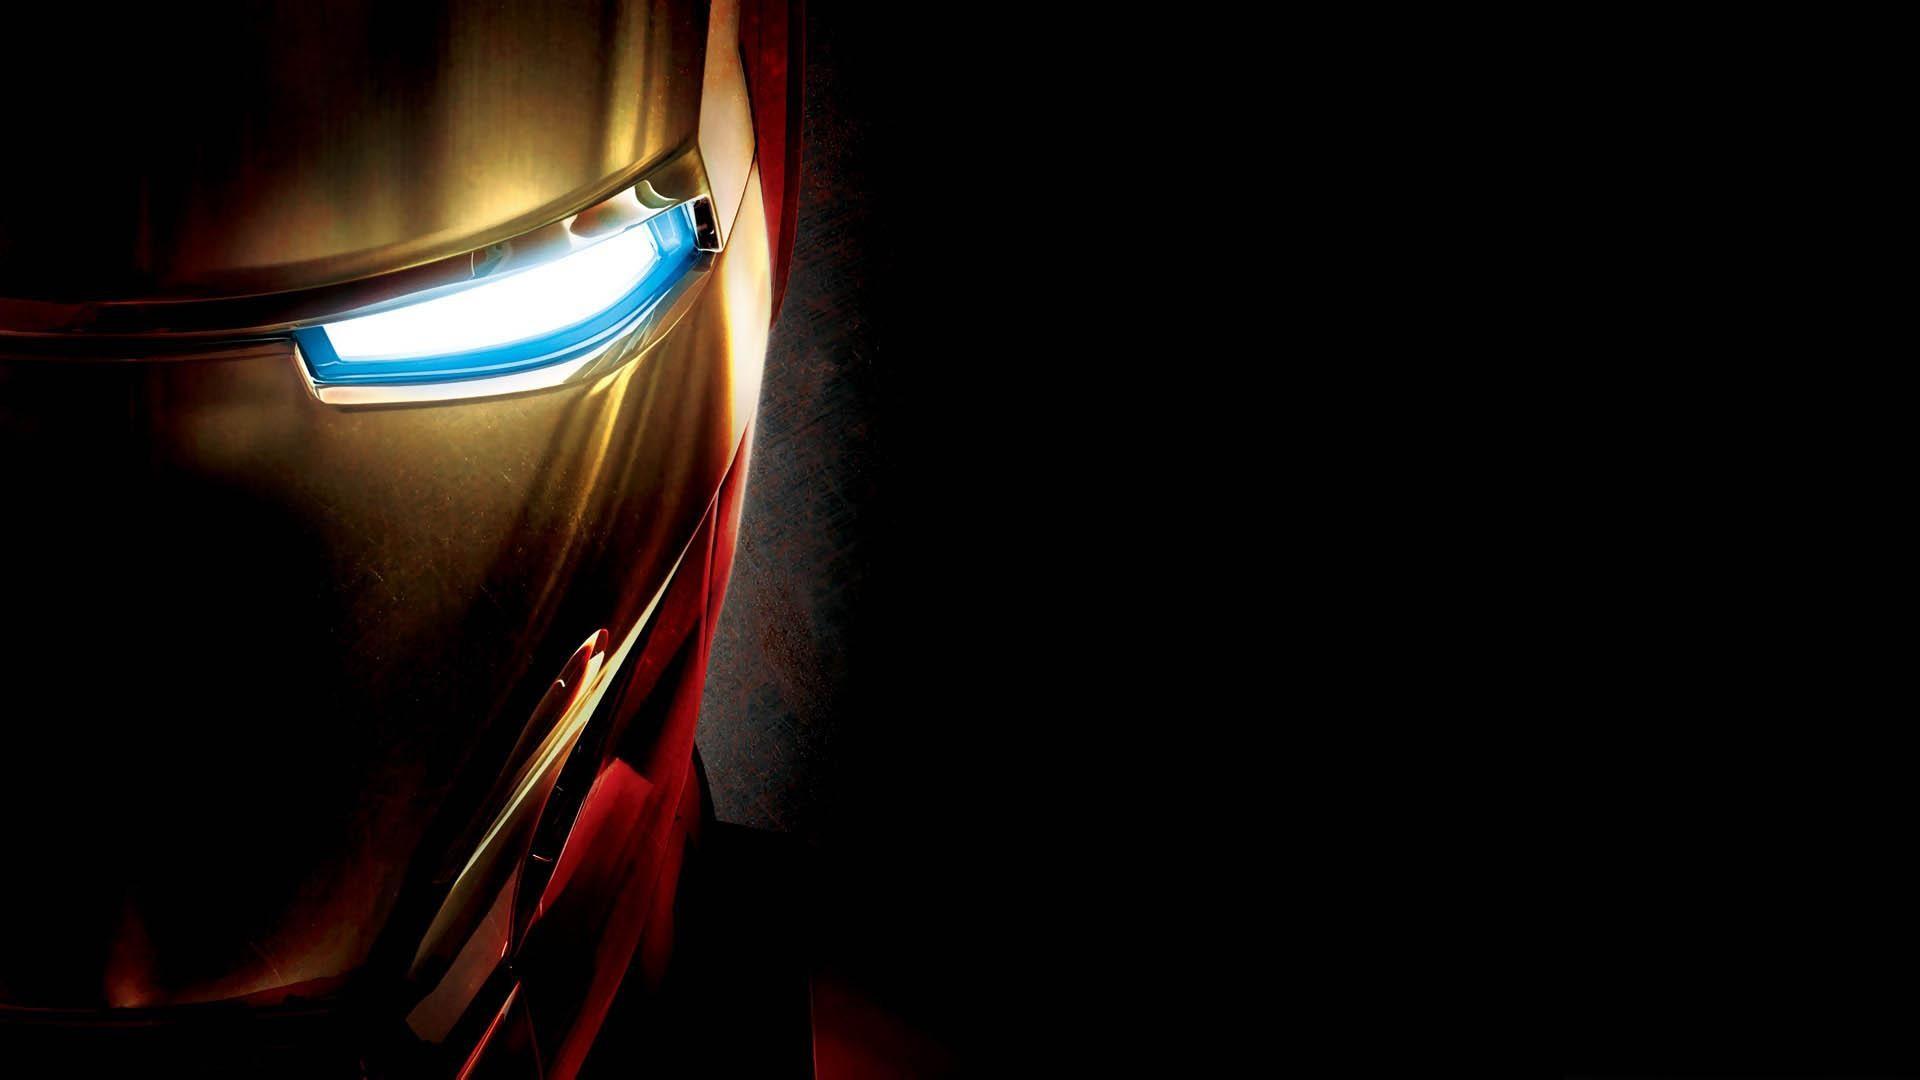 … Arc Reactor Wallpaper. Iron Man Mask Close Up Wallpaper